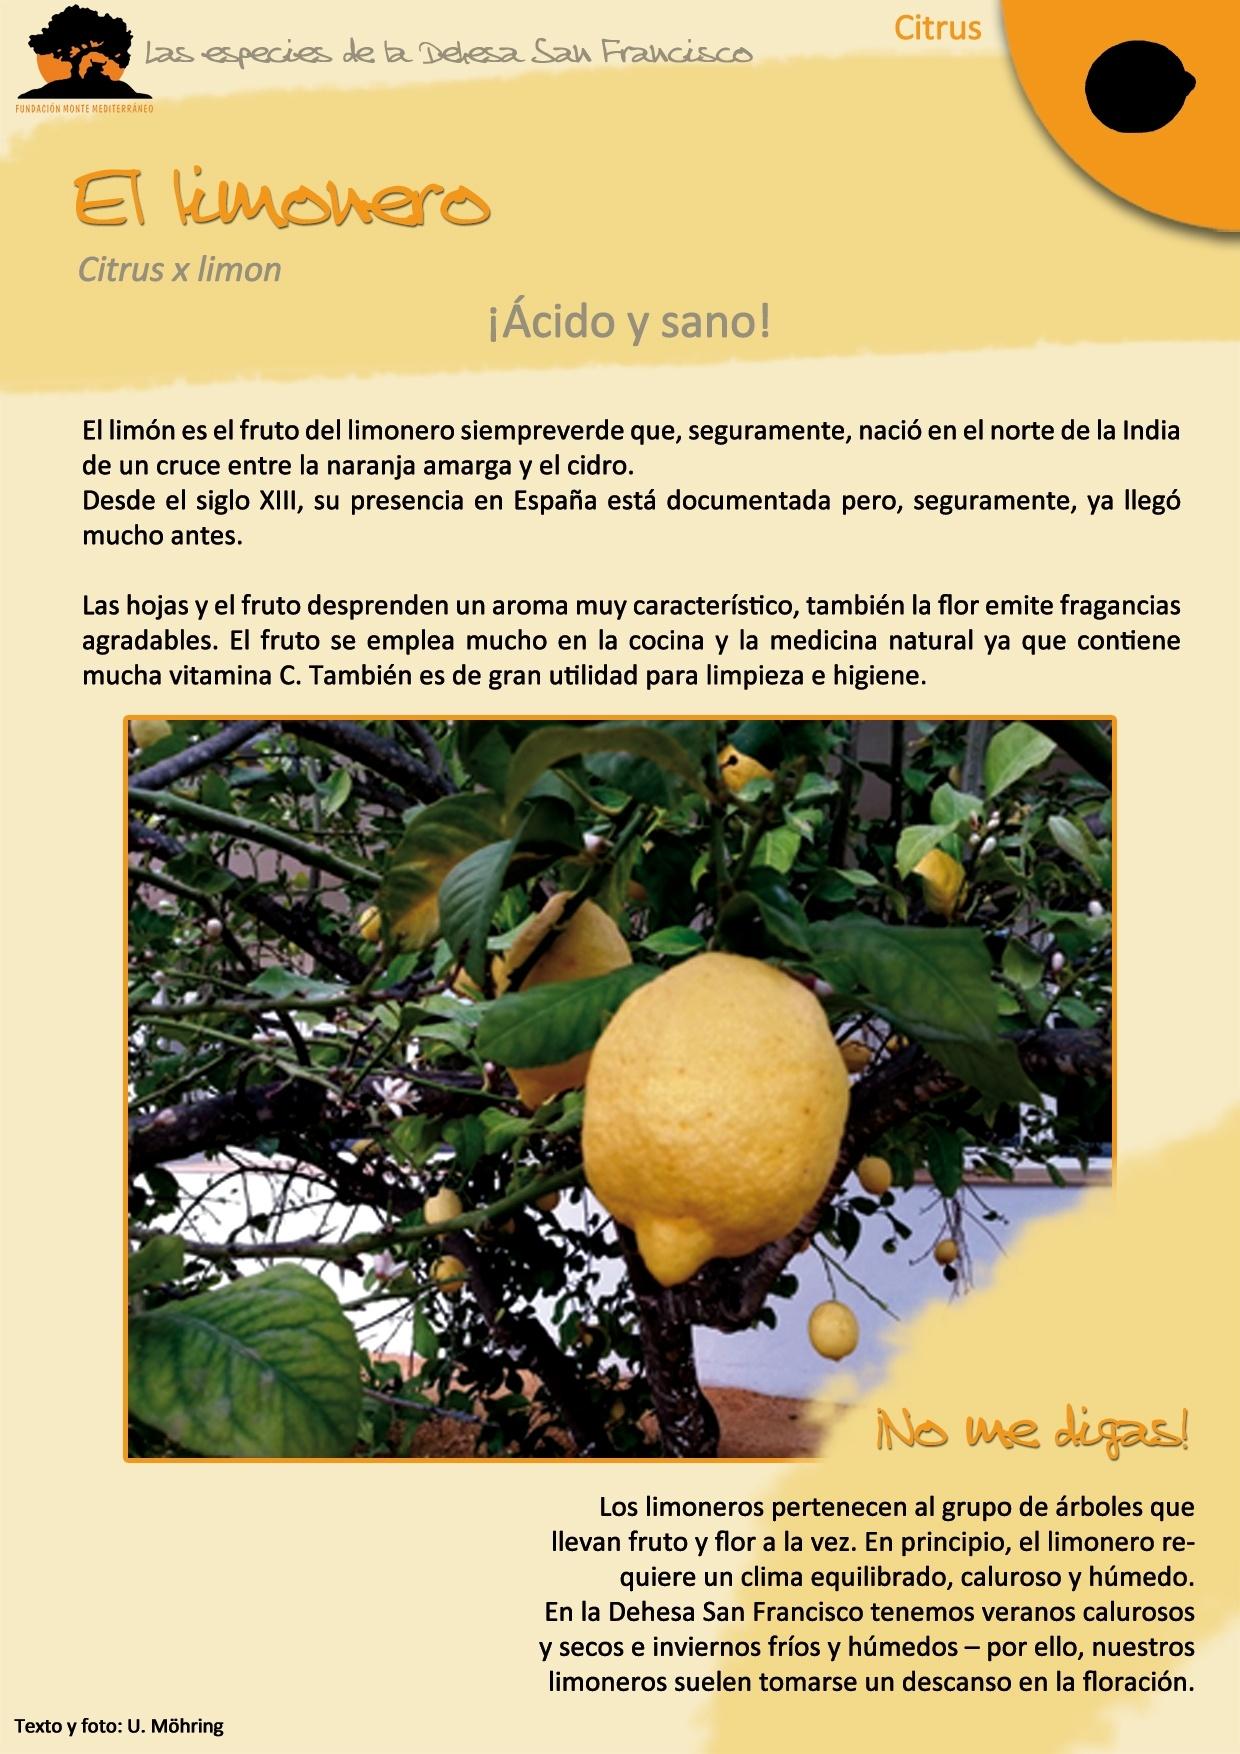 El limonero